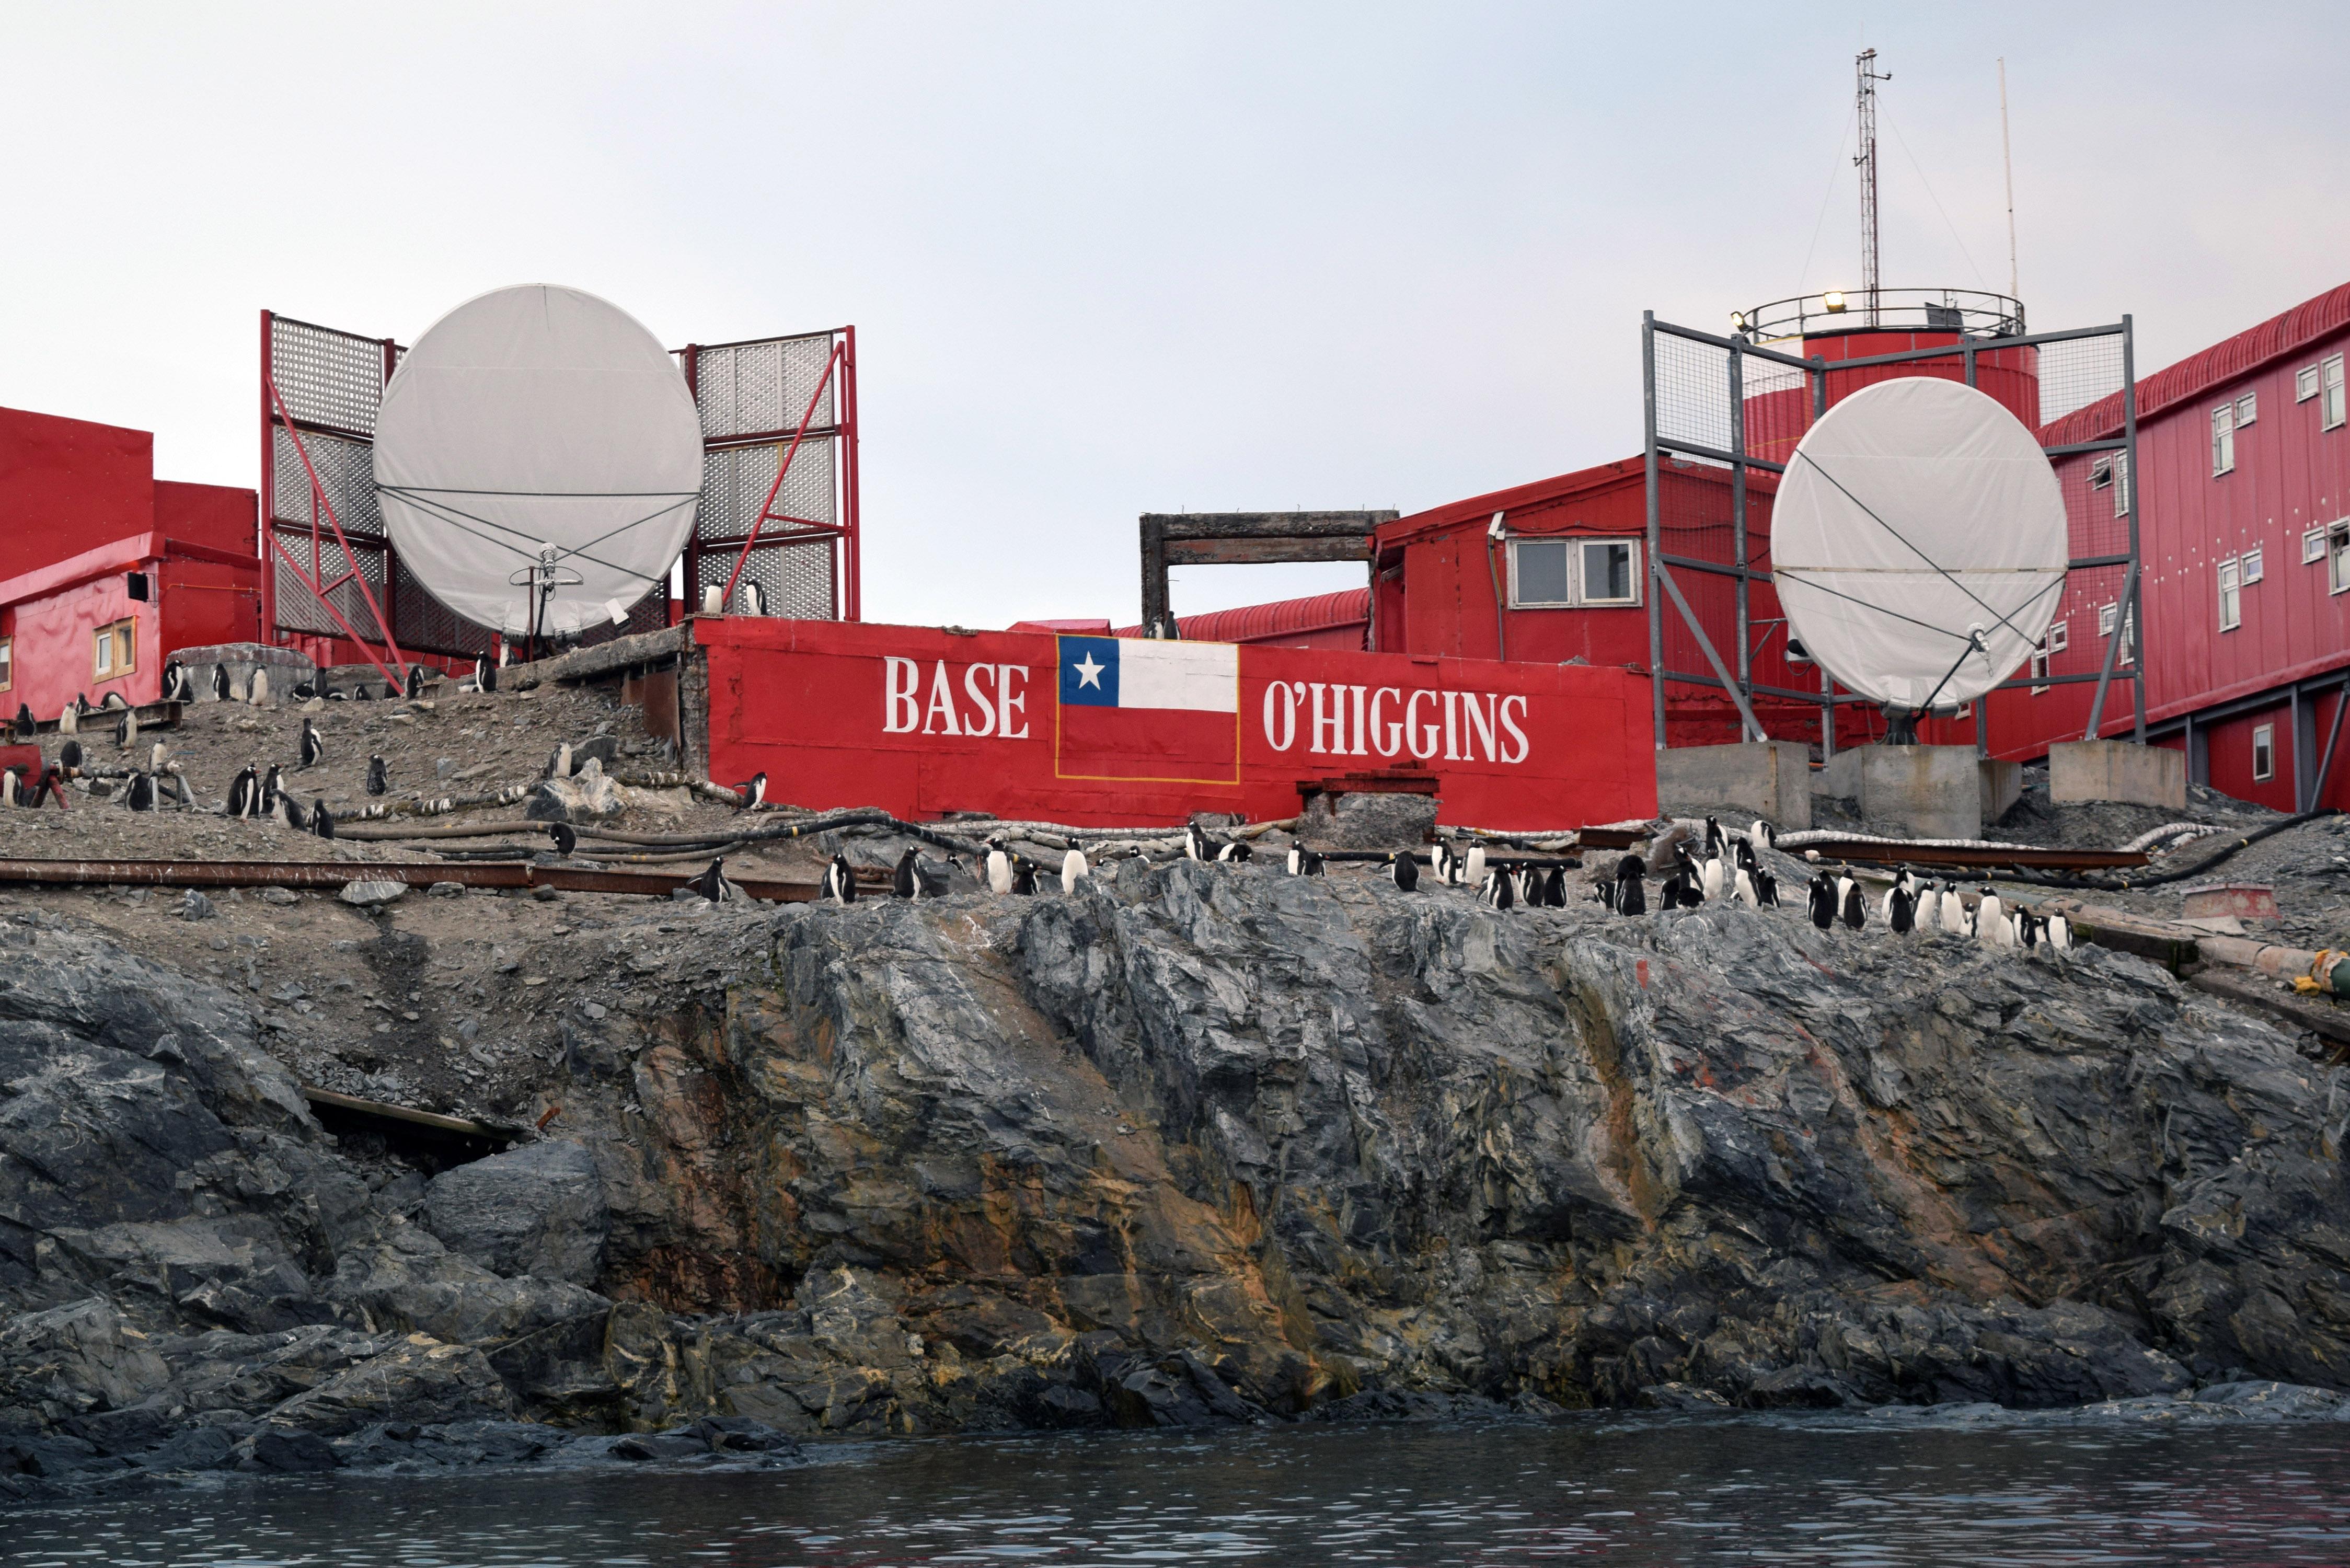 O'Higgins Base